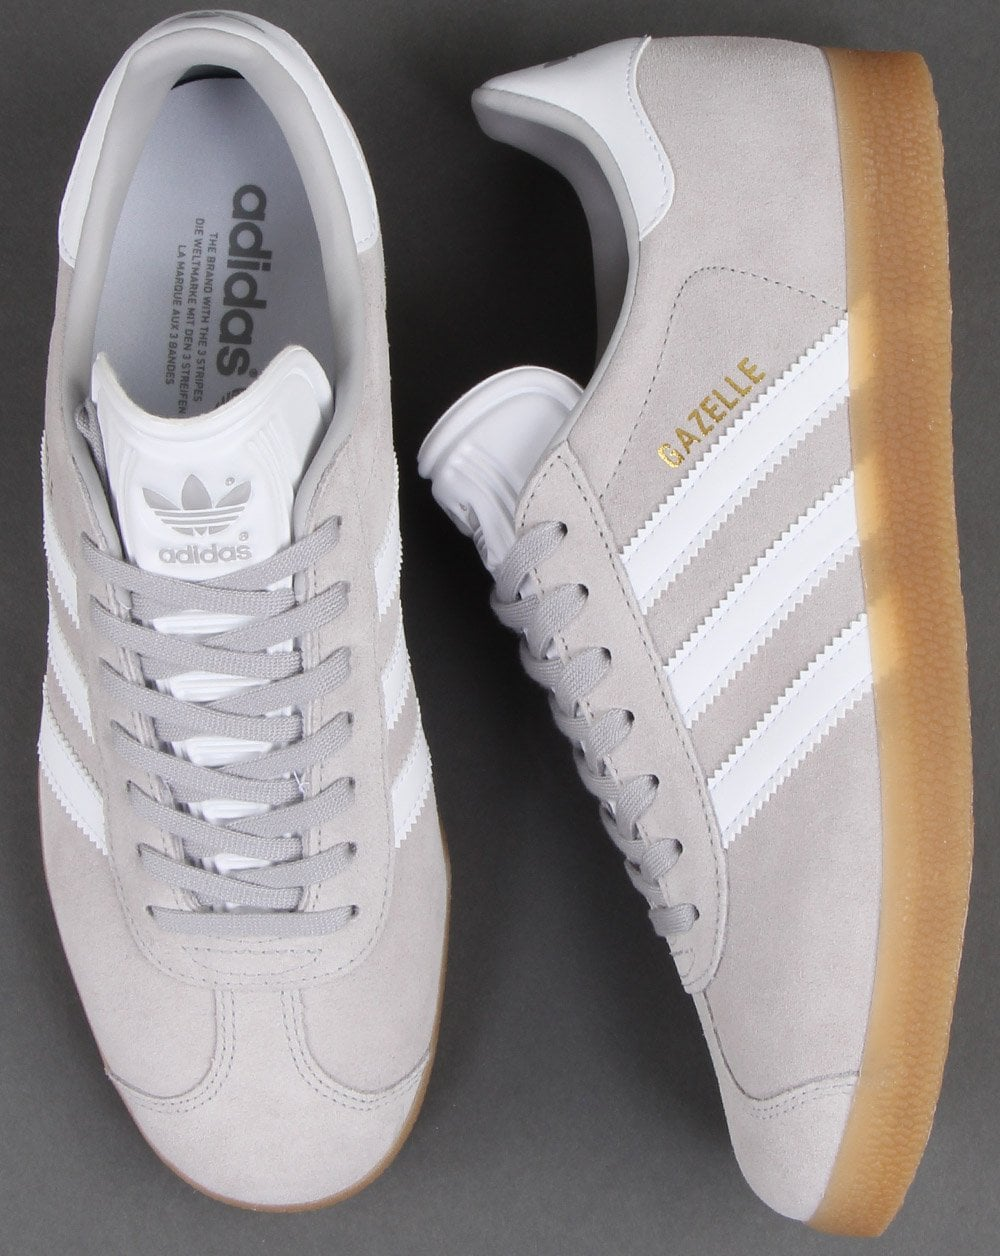 buy online 48e35 8da0d adidas Trainers Adidas Gazelle Trainers Grey White Gum